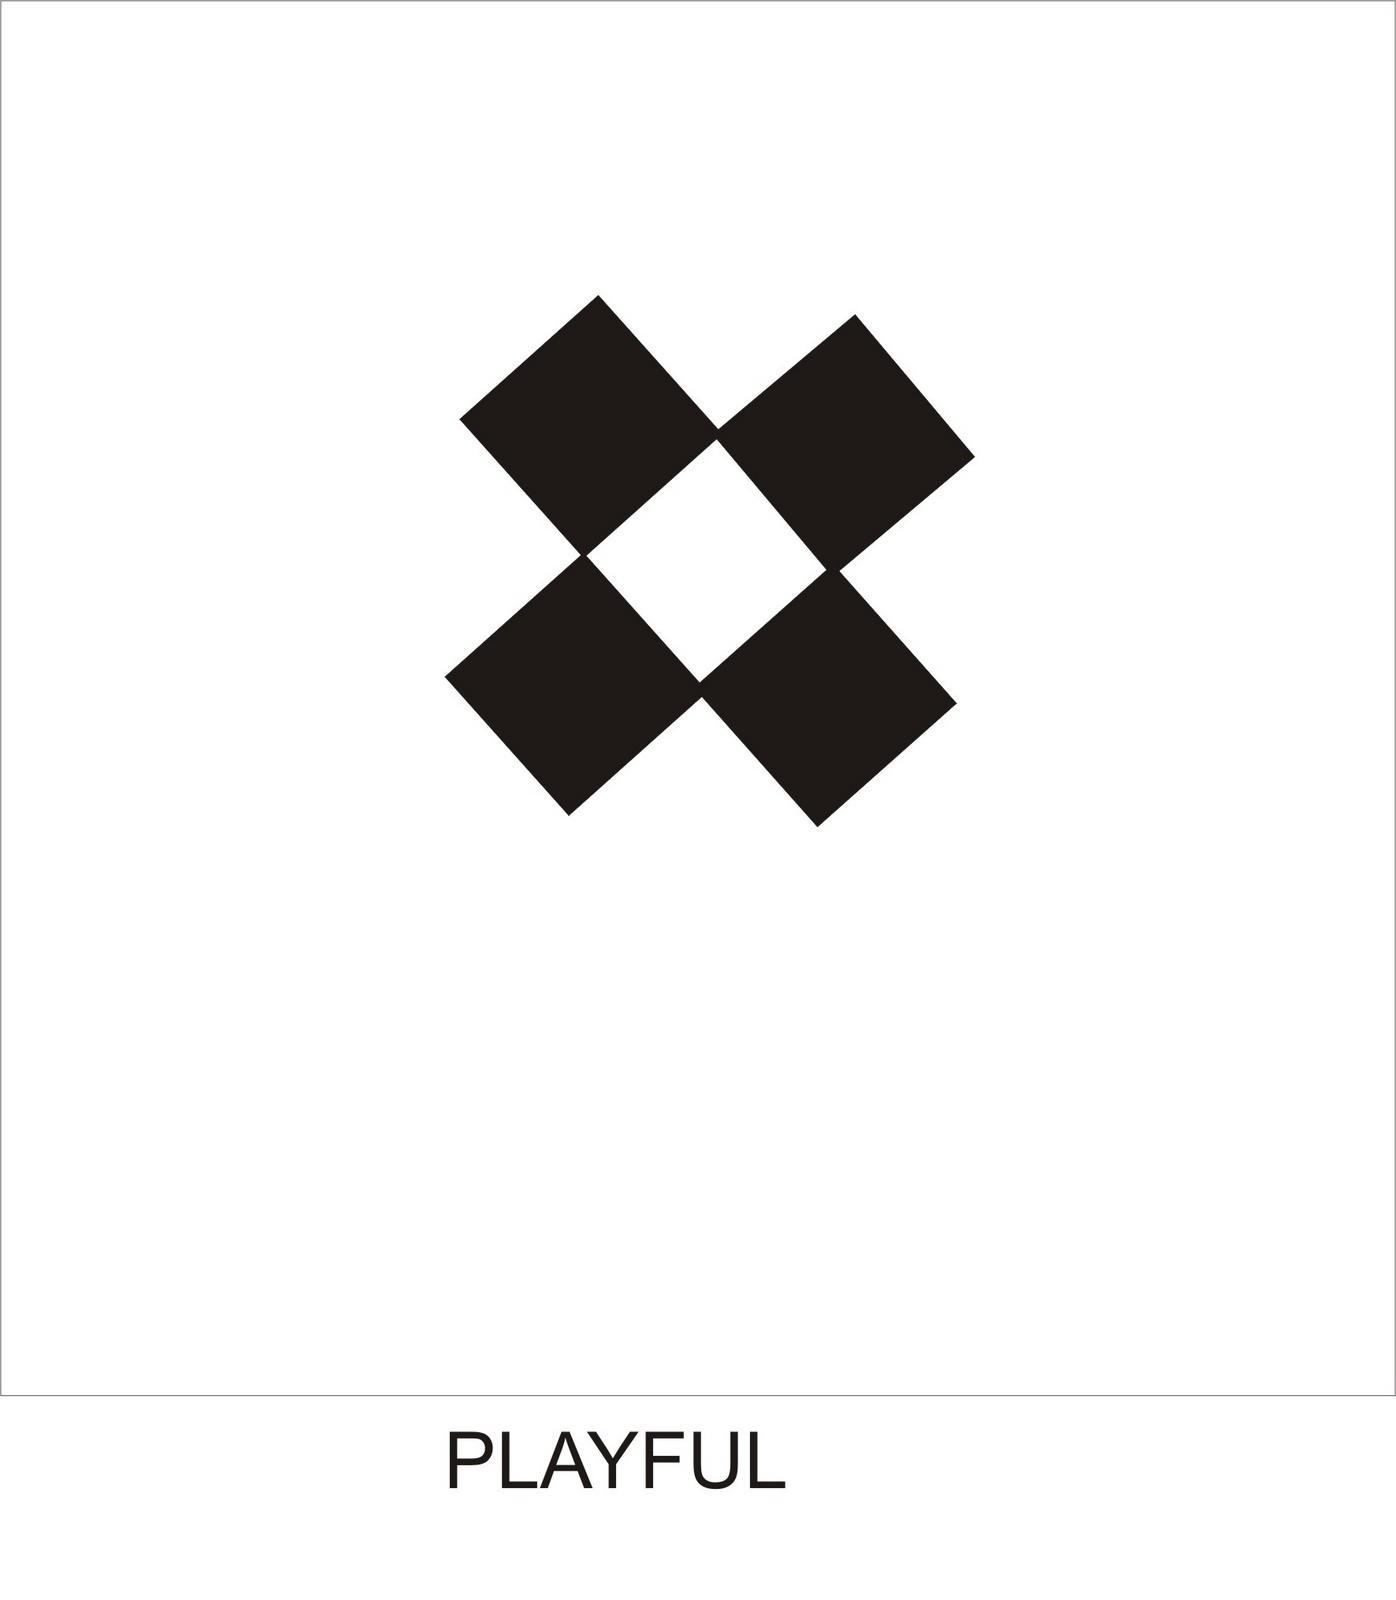 Gr.11 Graphic Design: Black Square Problem